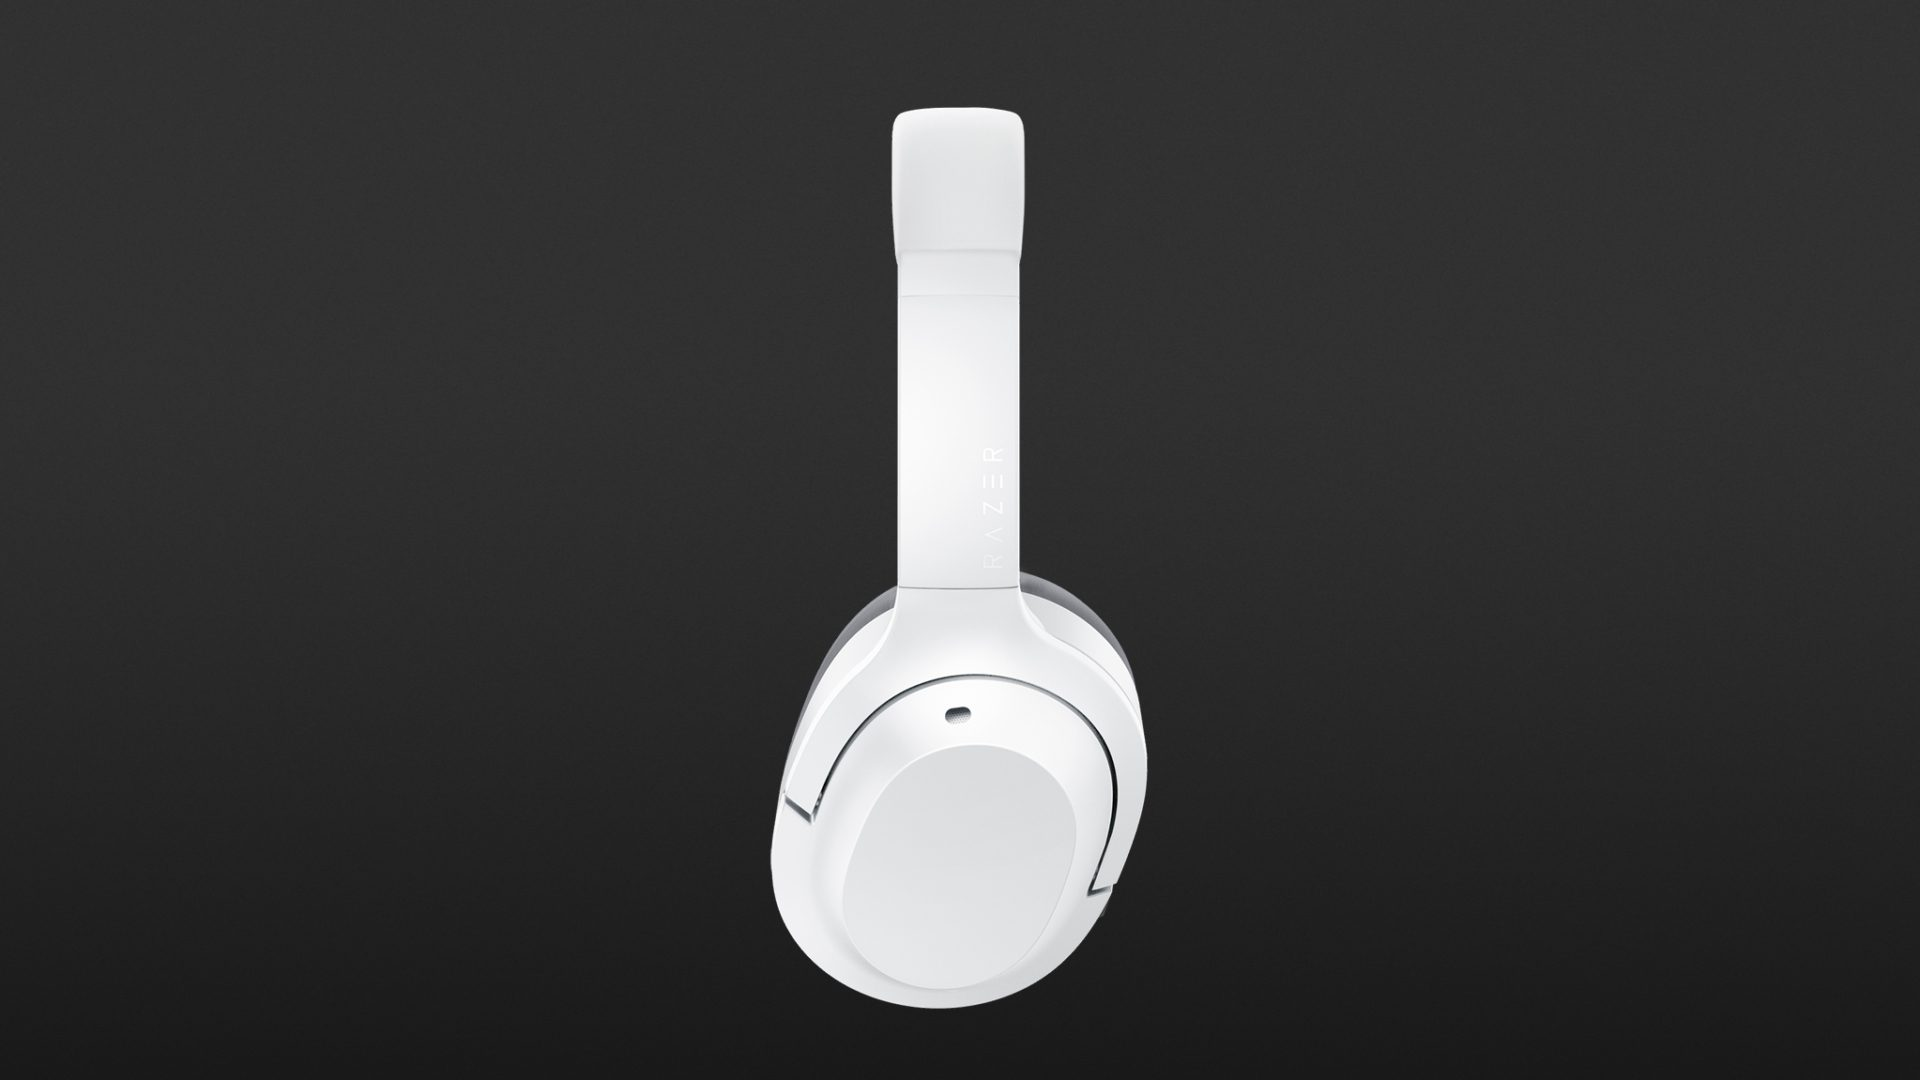 https://www.headphonecheck.com/test/razer-opus-x/